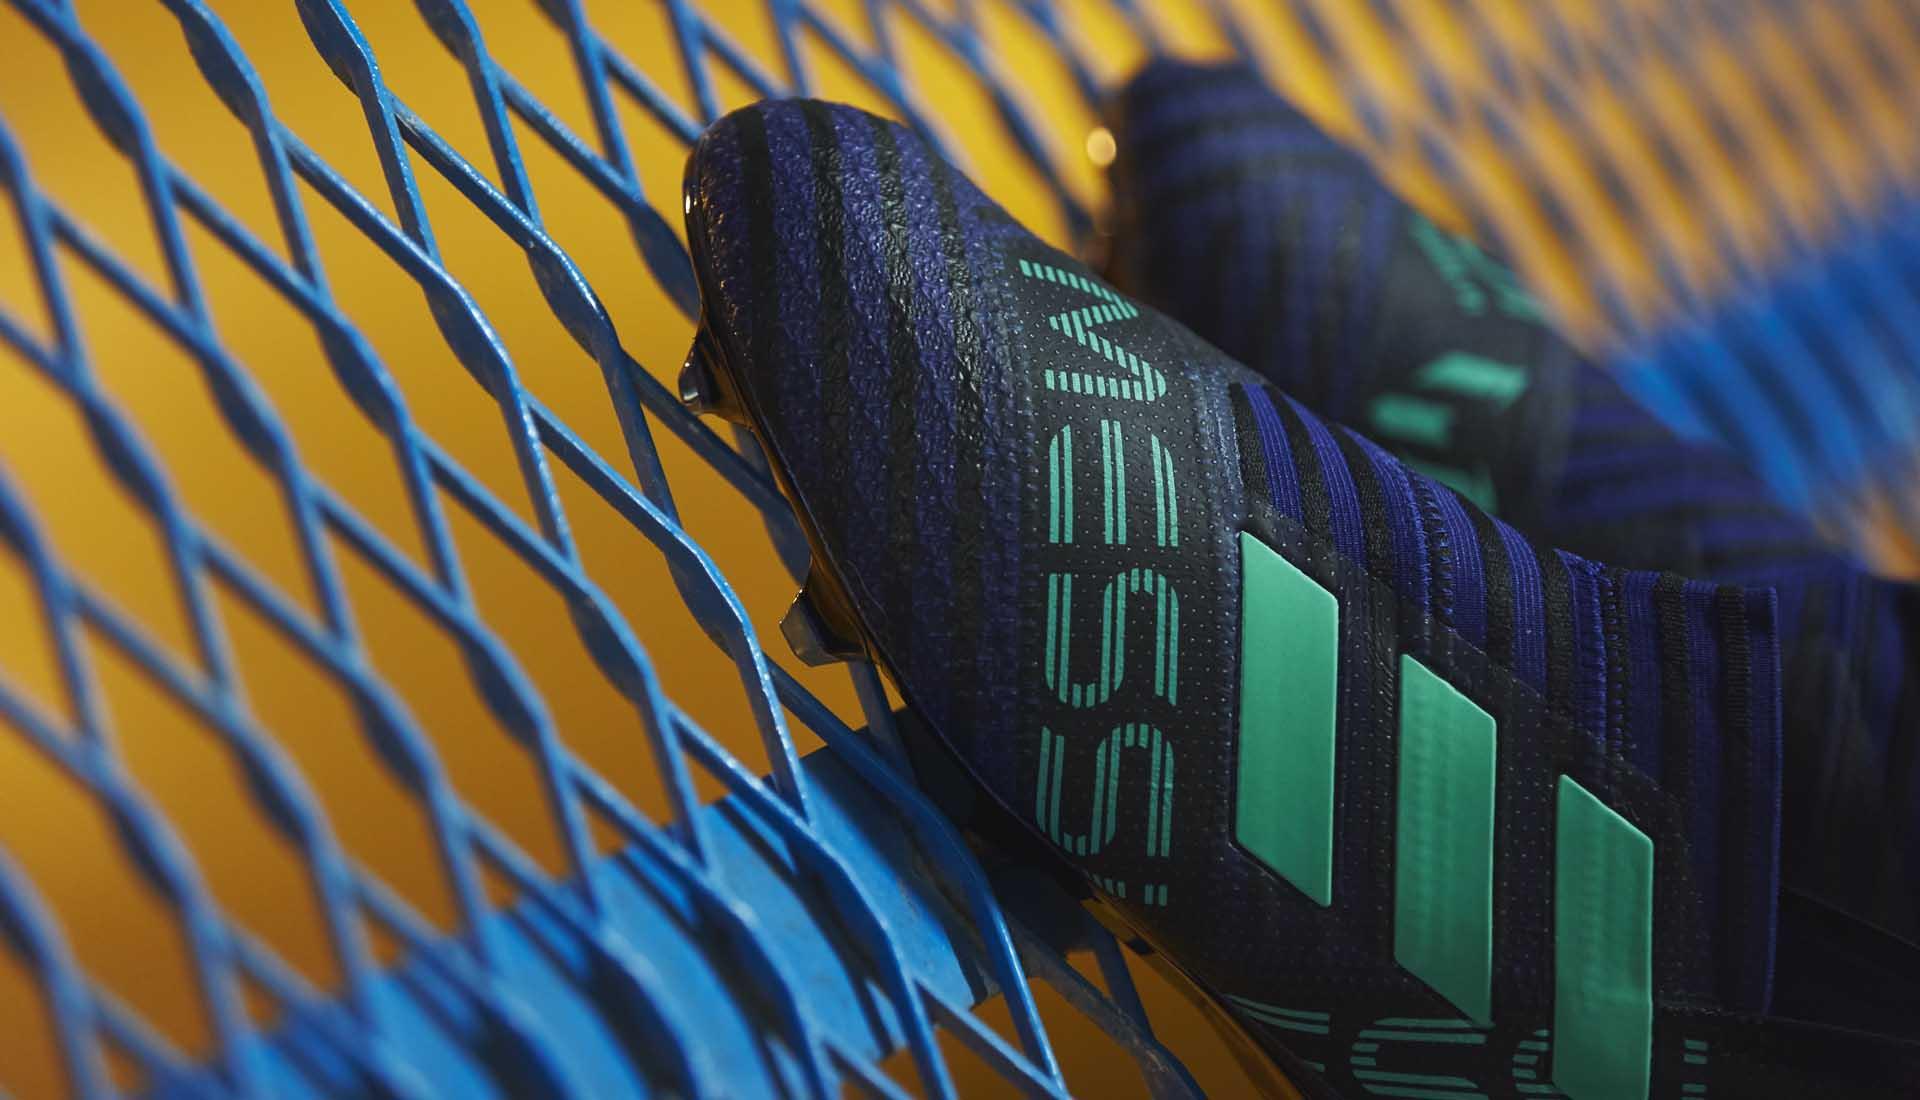 adidas Launch The Nemeziz Messi 17+